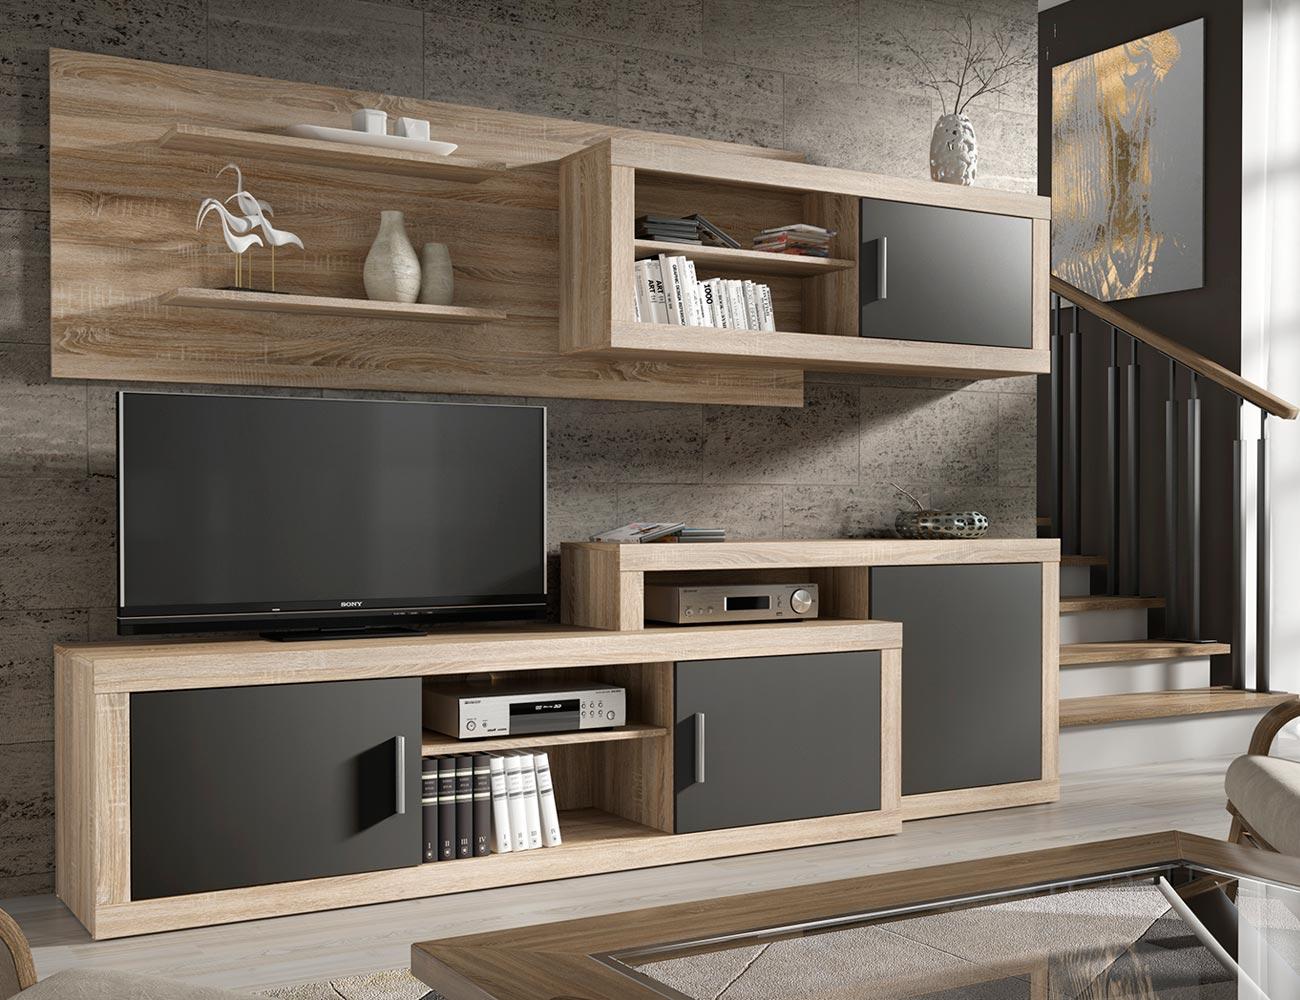 Mueble de sal n estilo moderno composici n nica 2092 factory del mueble utrera - Factory del mueble utrera ...